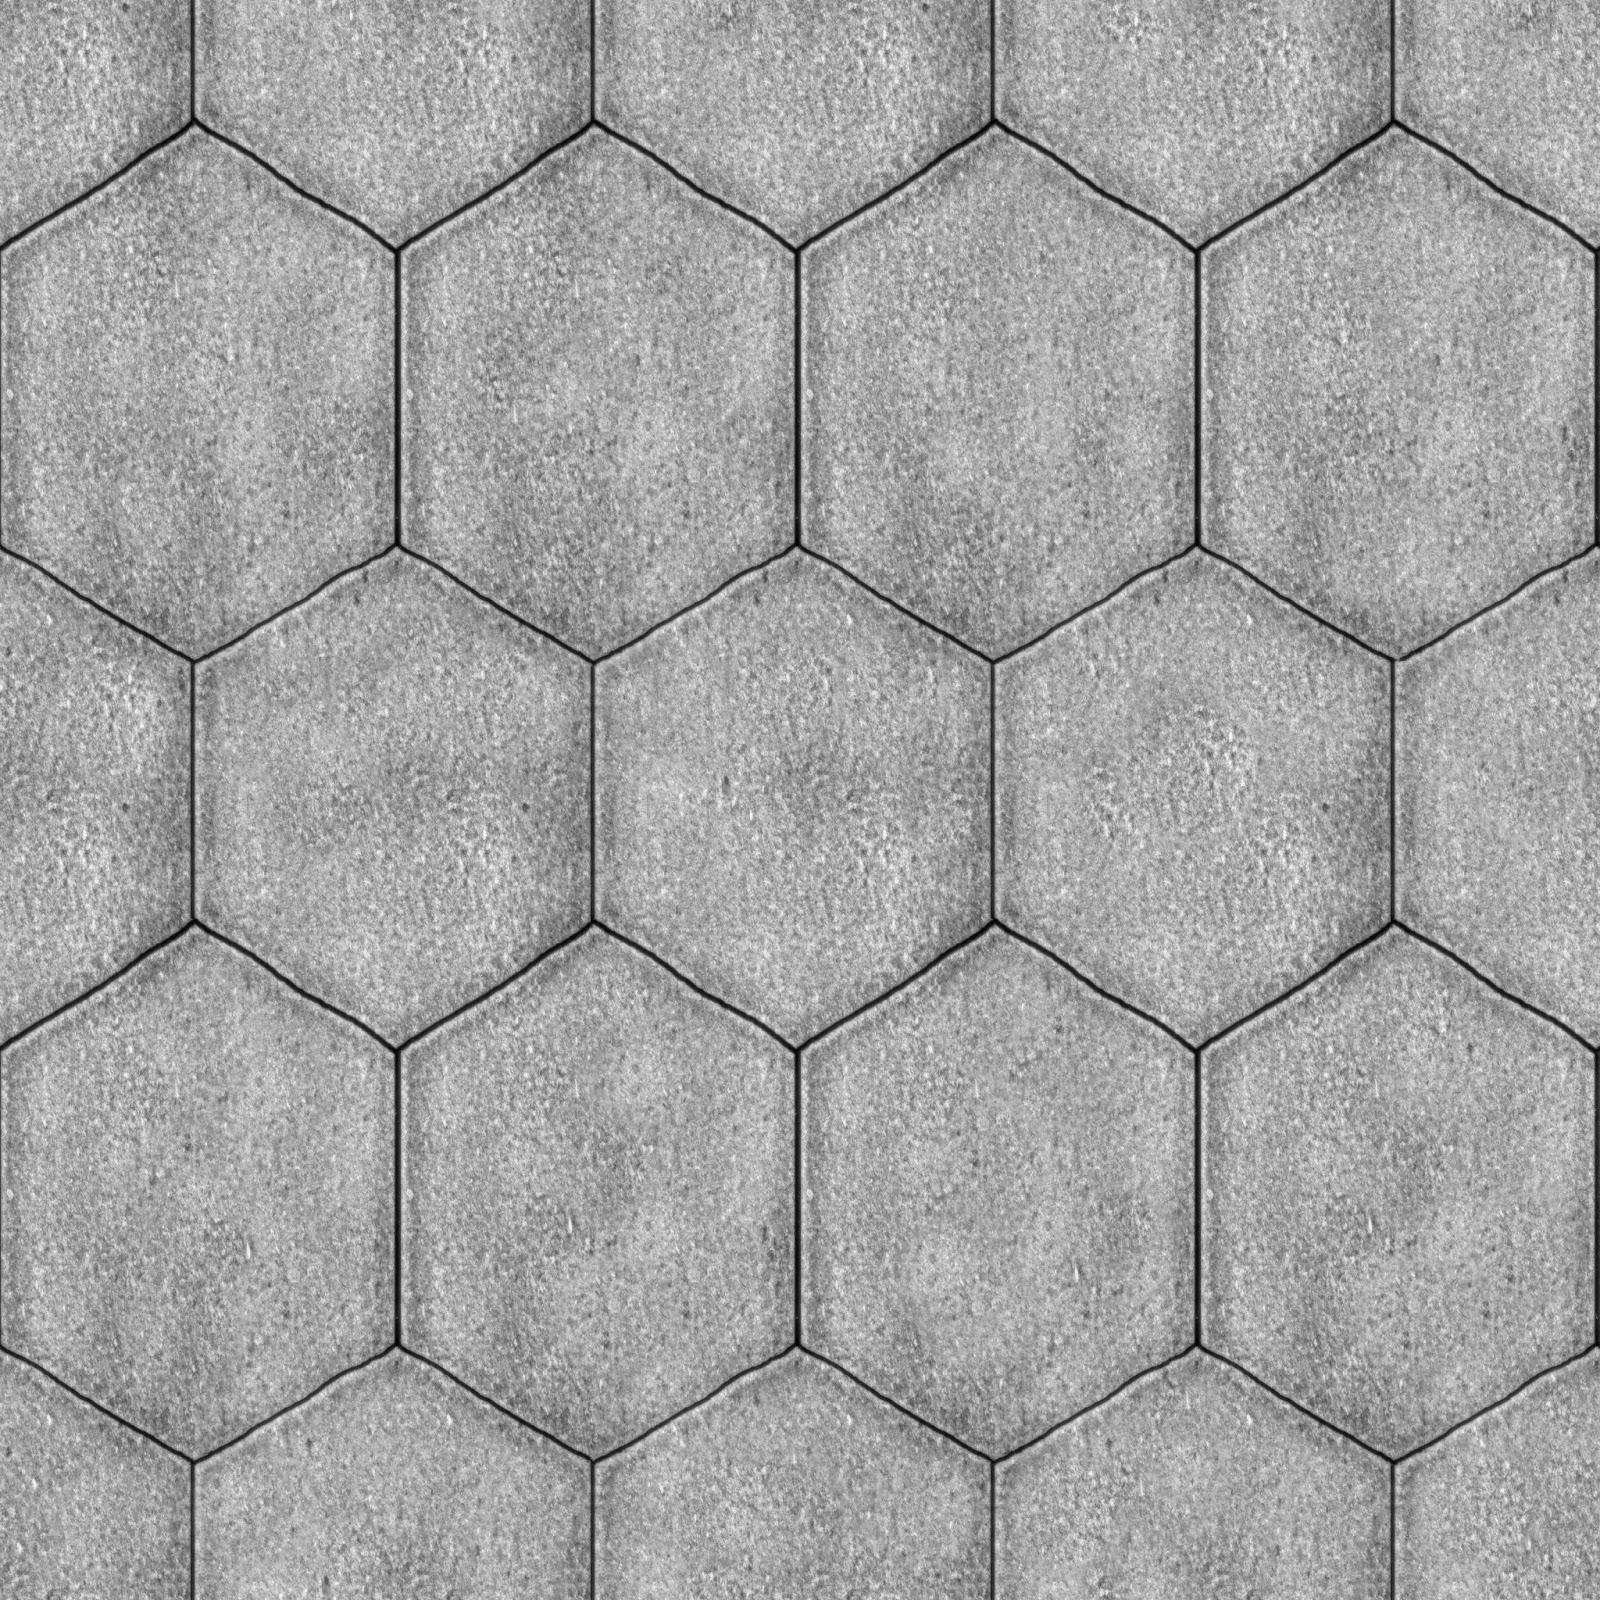 Tileable Hexagonal Stone Pavement Texture Maps